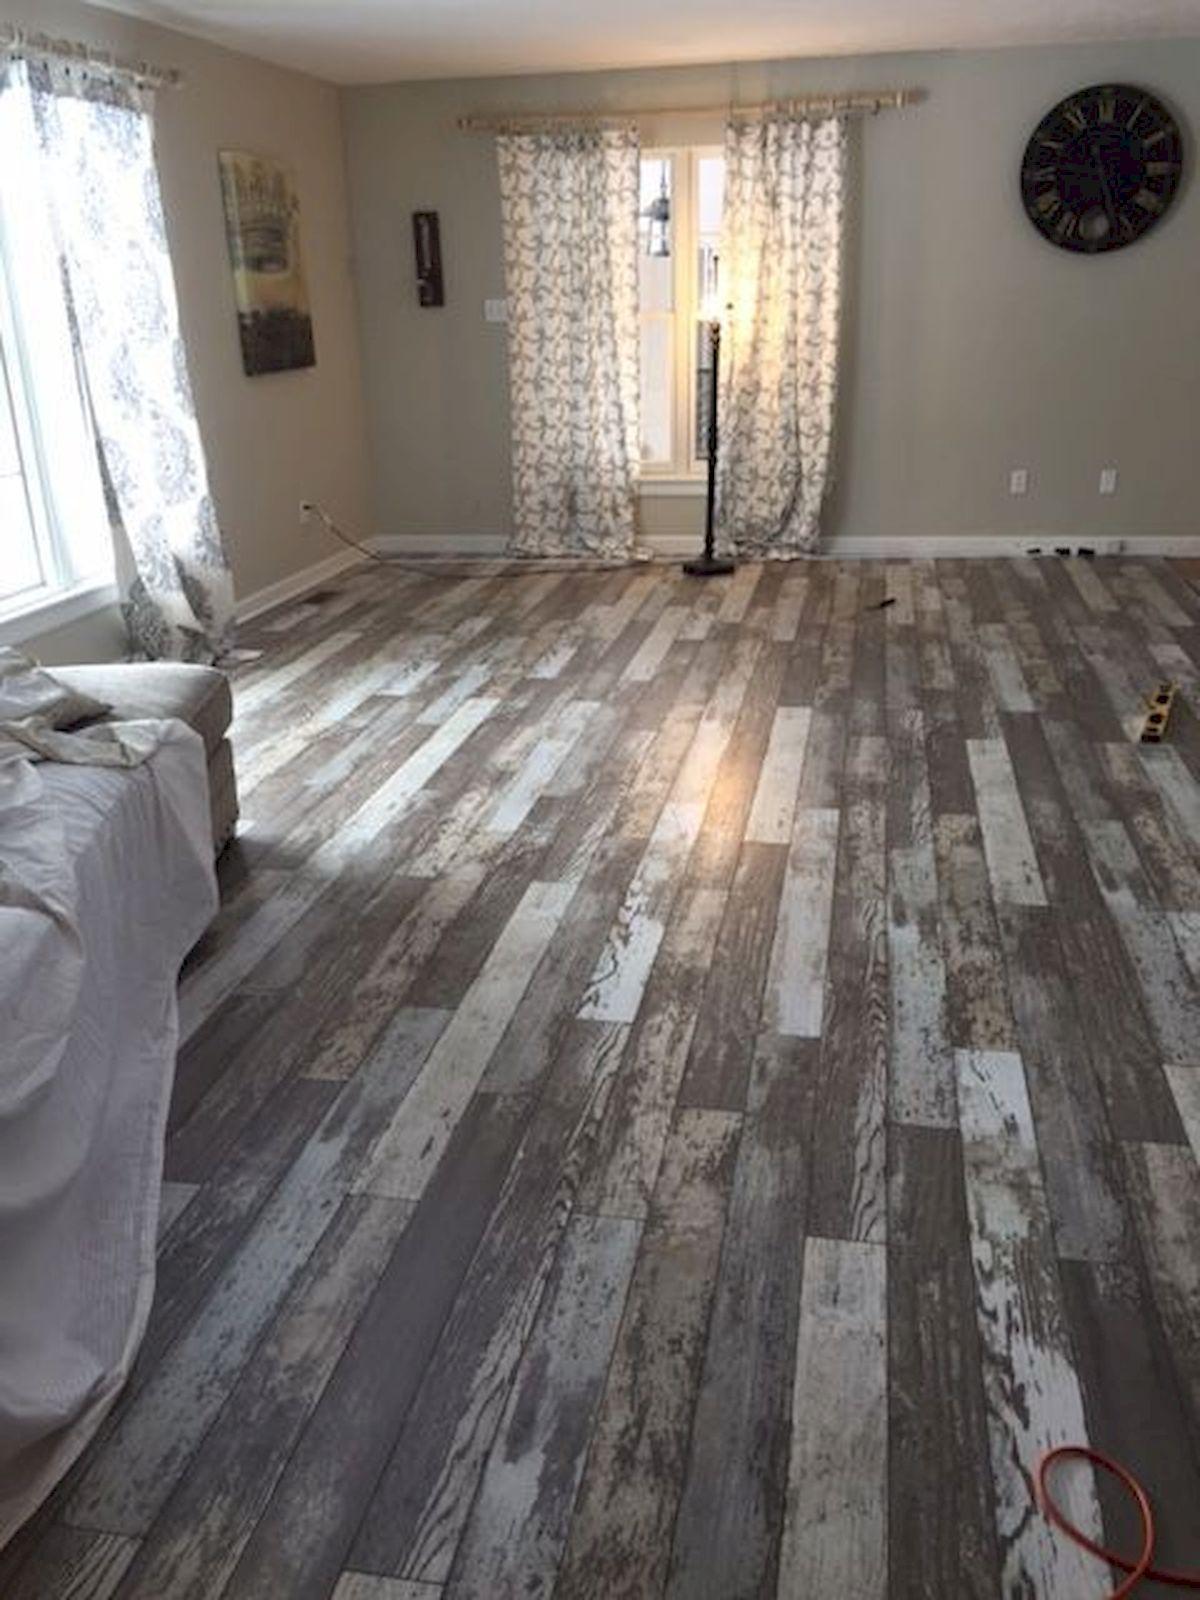 80 Gorgeous Hardwood Floor Ideas for Interior Home (25)